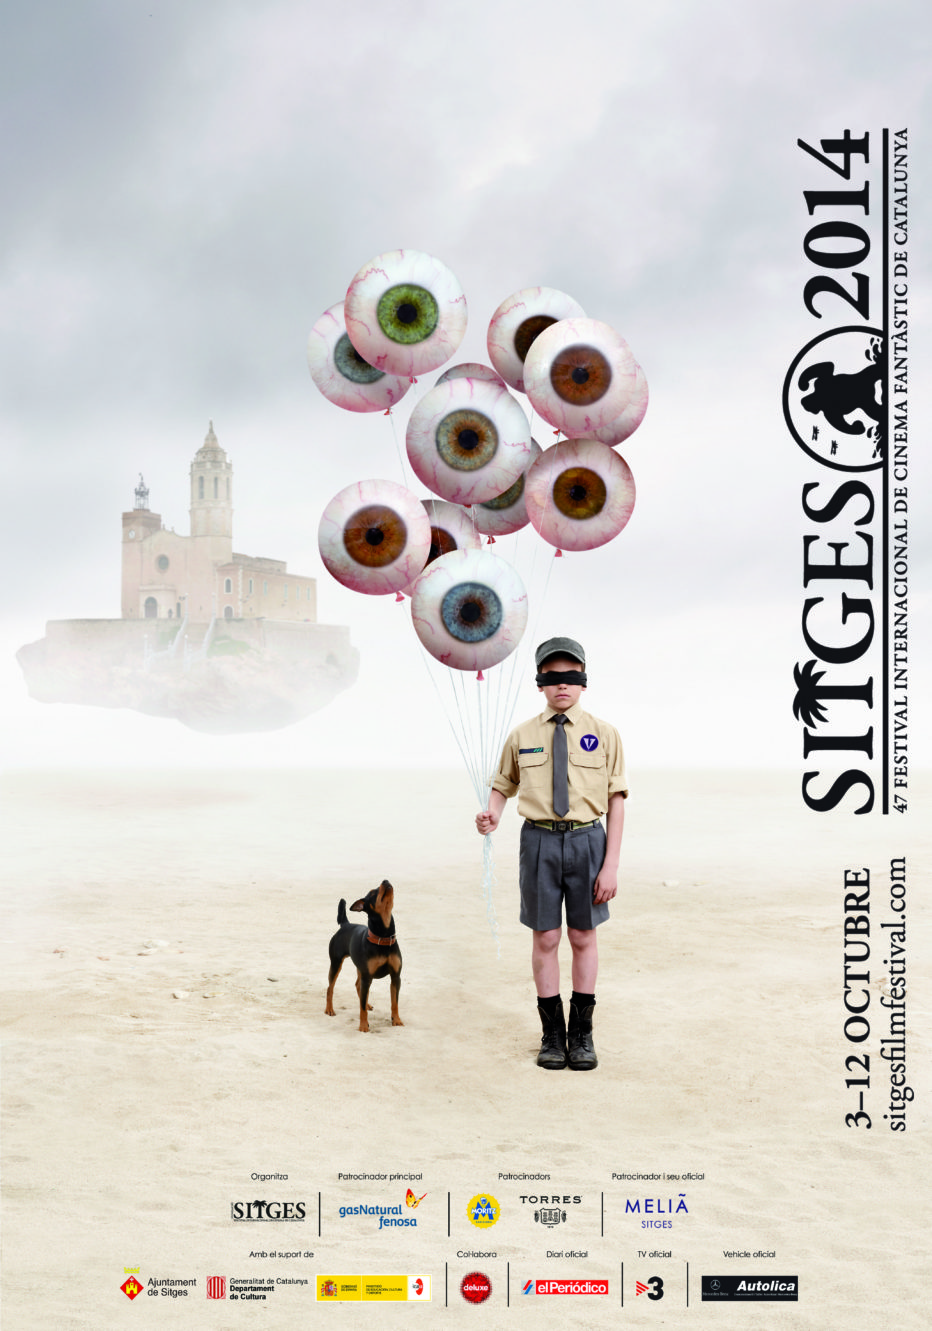 Sitges 2014: Kotcheff, Campusano, German, Hillcoat, Aoyama, Sofian y Cannon Films, protagonistas de Seven Chances